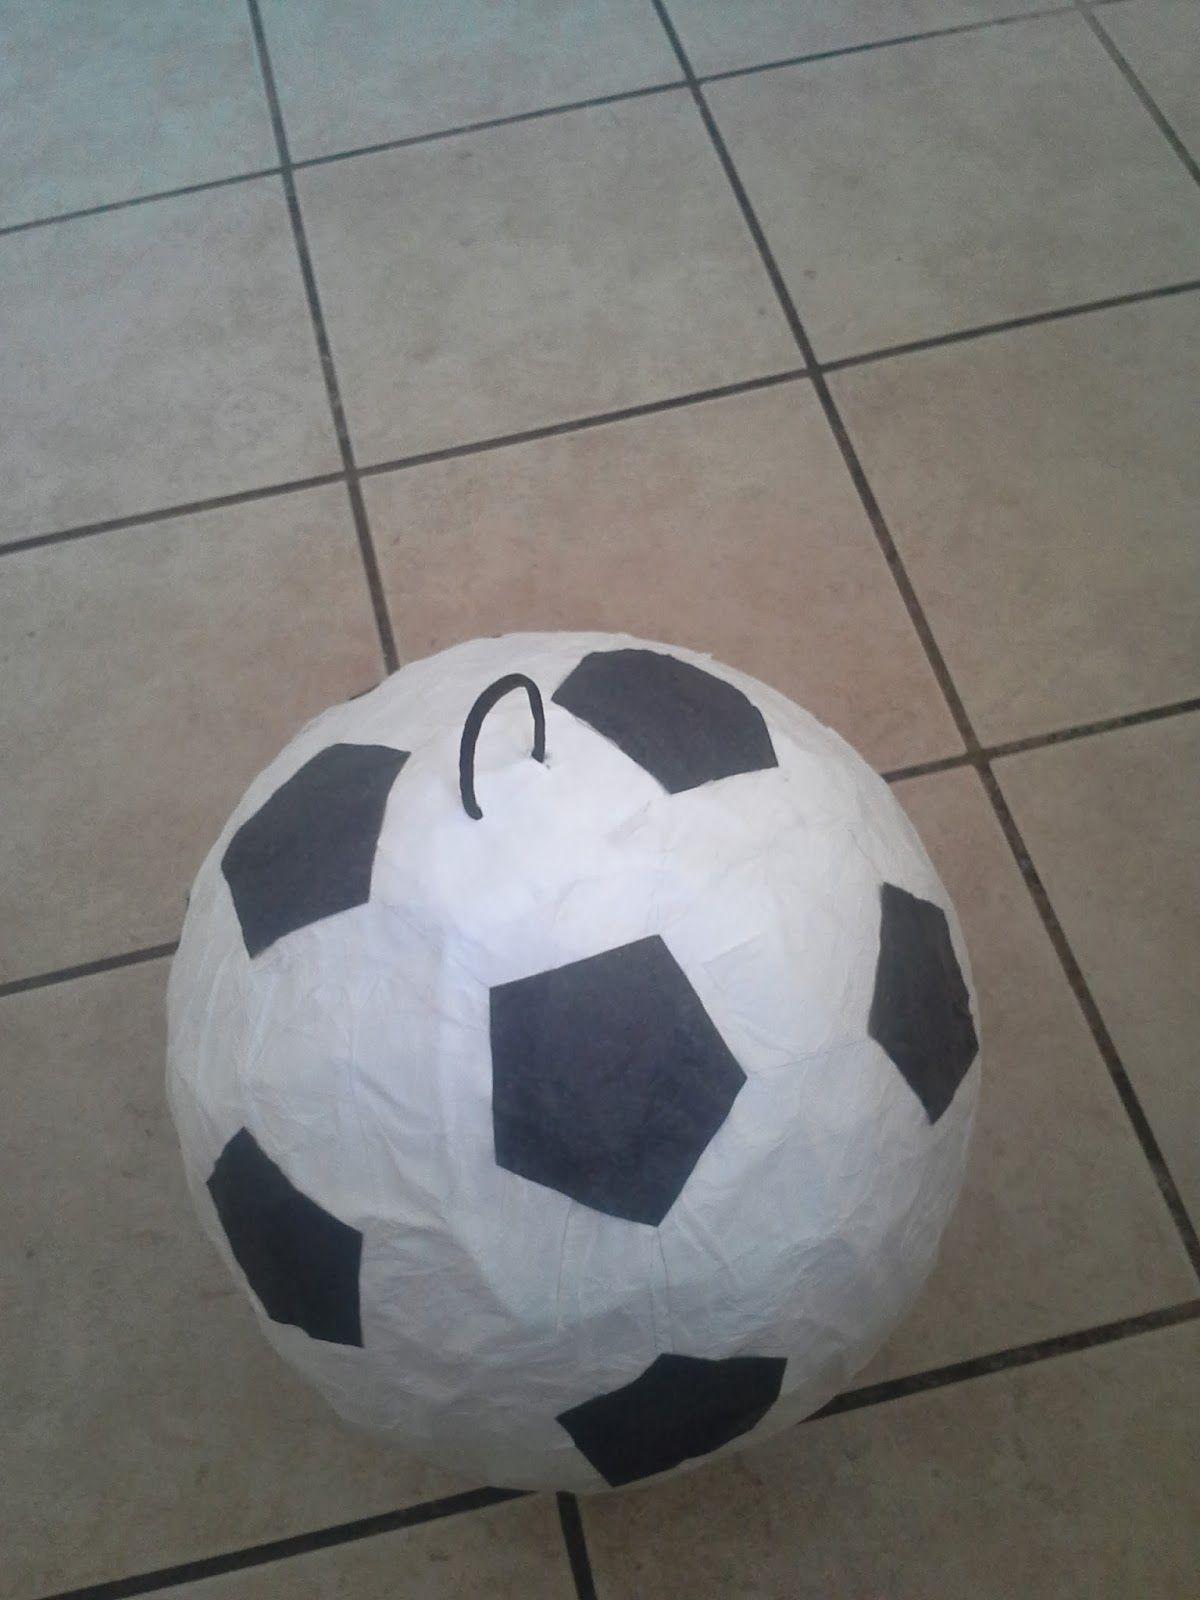 This Lovely-Crazy-Fun Life: Soccer Ball Shaped Piñata